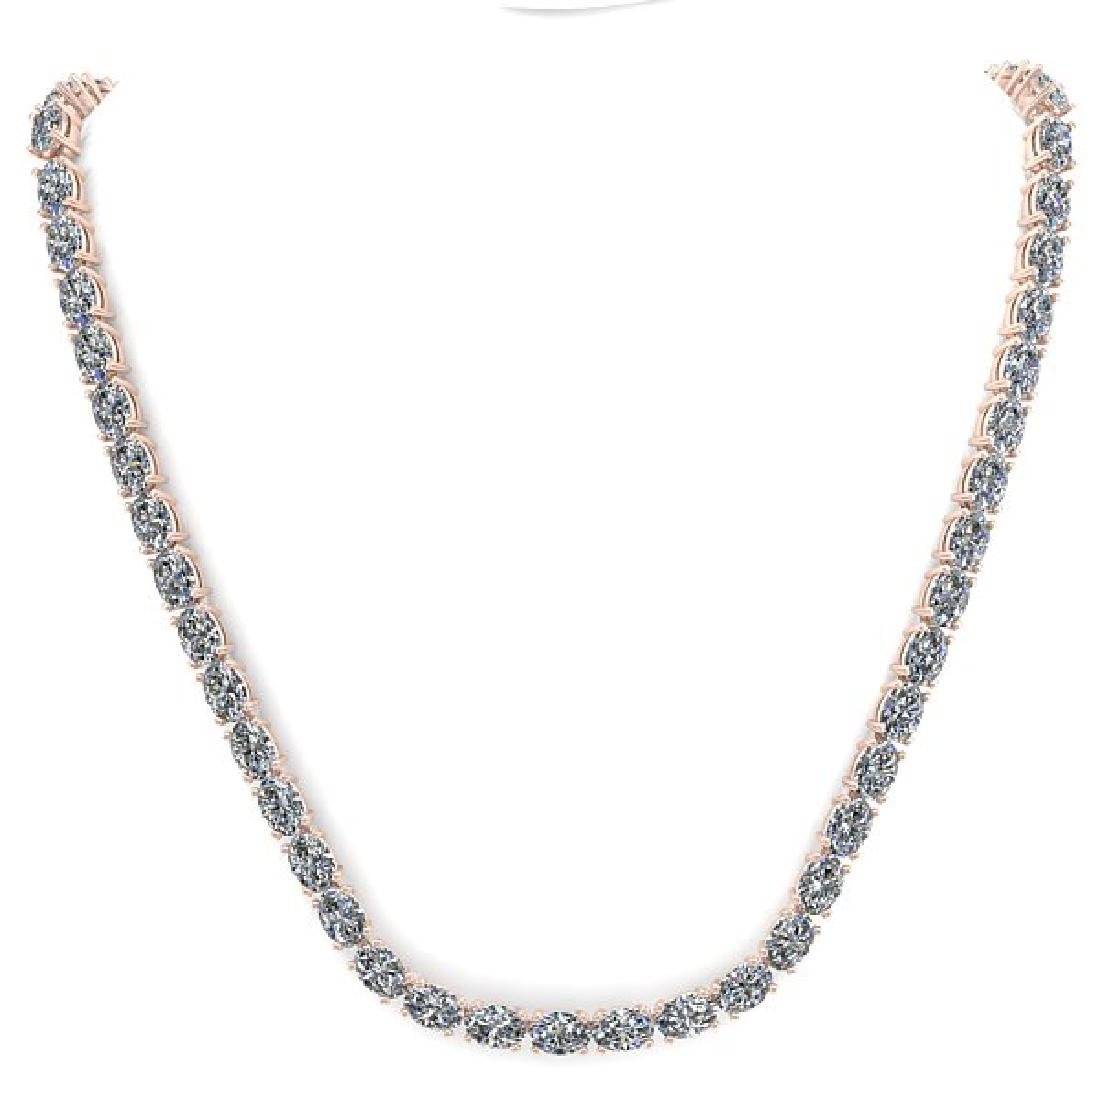 30 CTW Oval Cut Certified SI Diamond Necklace 14K Rose - 3